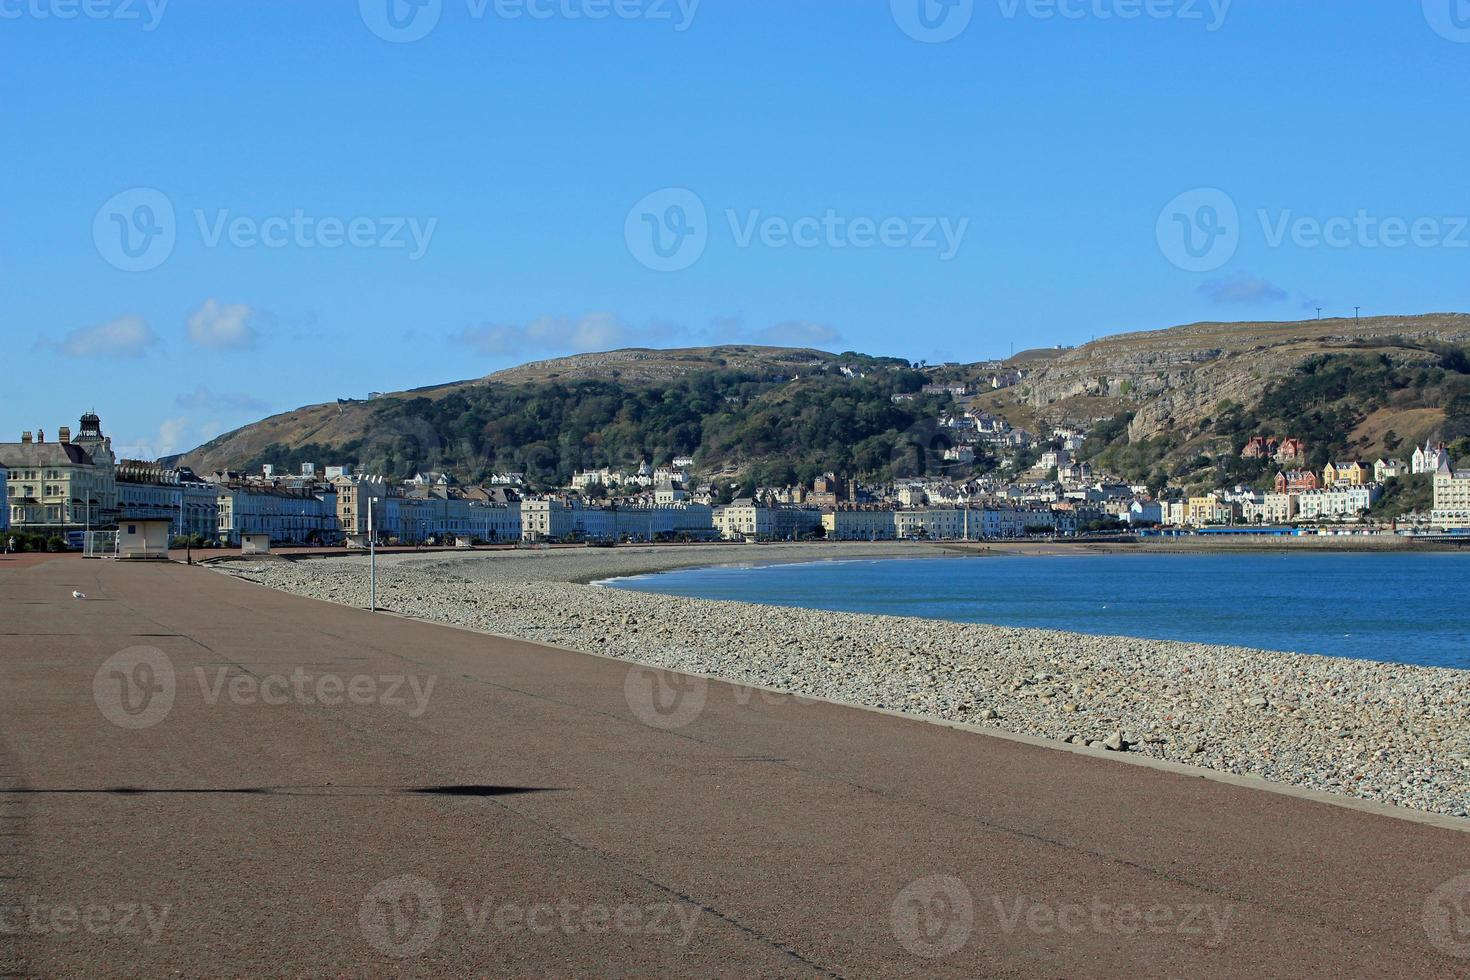 Typical British seaside photo